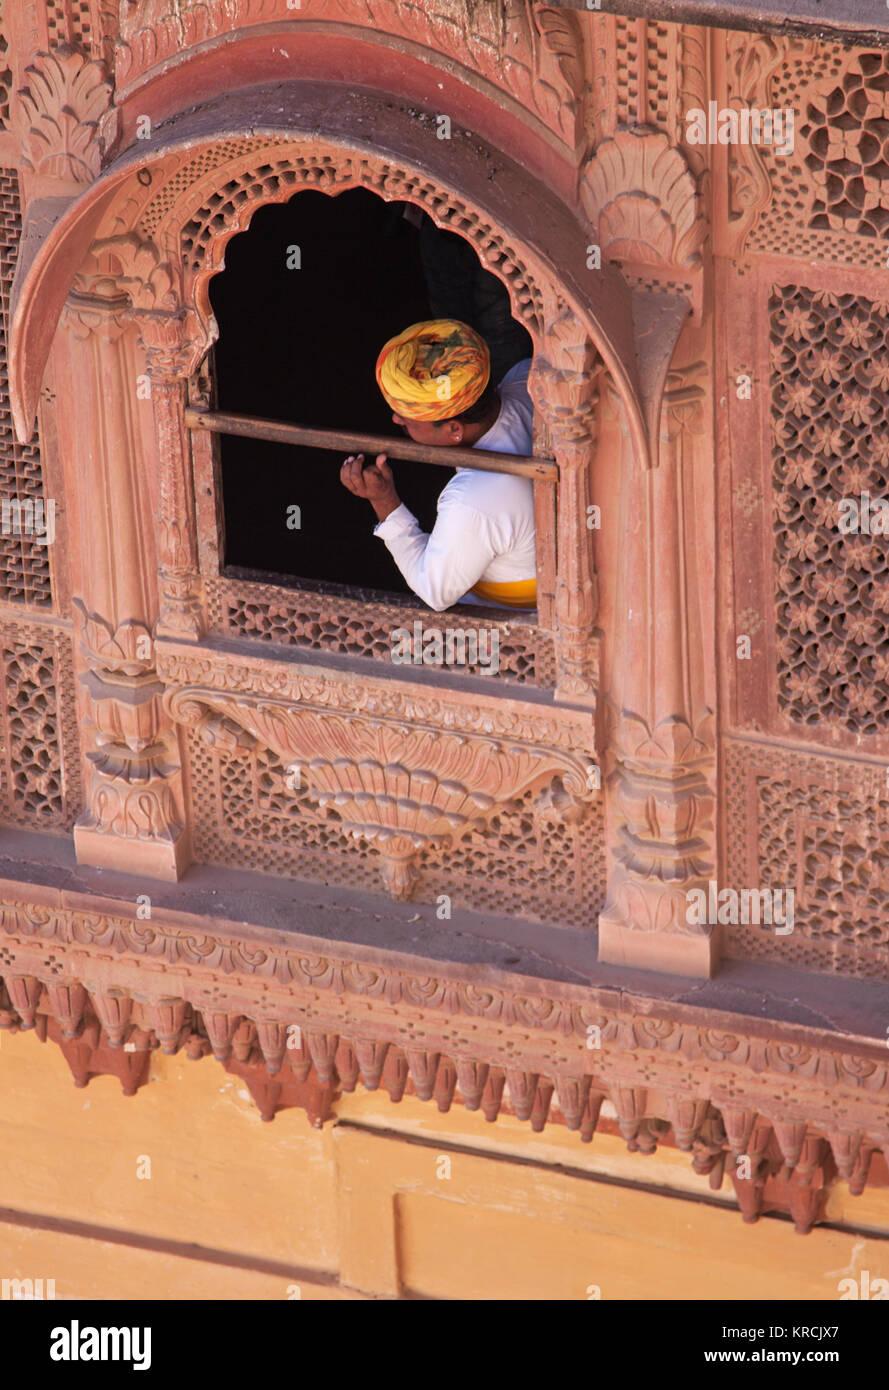 Un voyeur indien